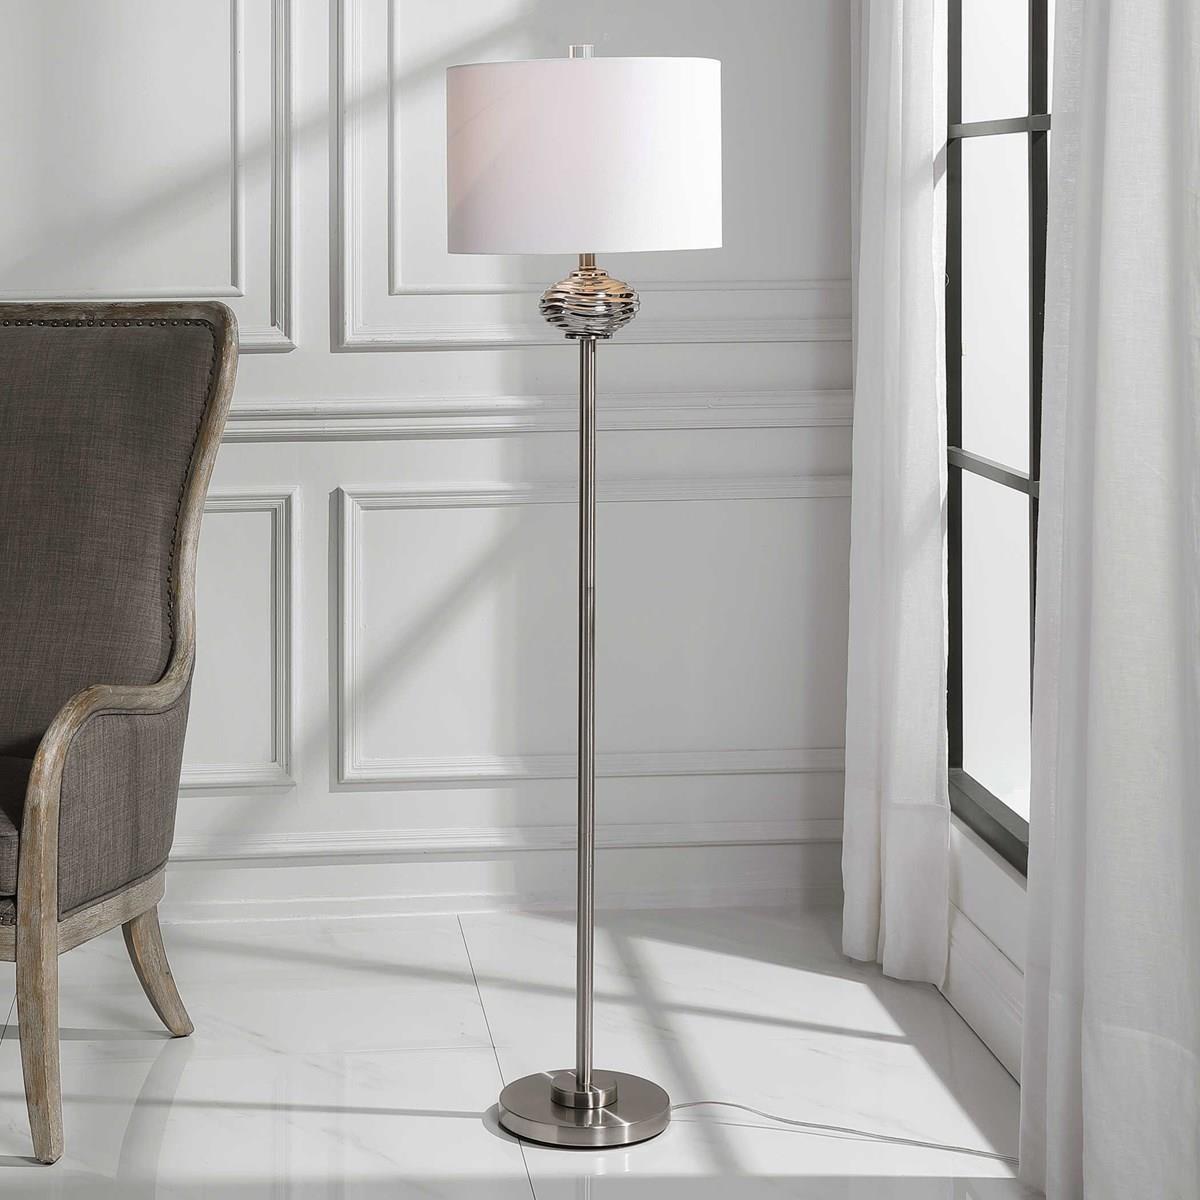 Floor Lamps CATALINA FLOOR LAMP by Unique at Walker's Furniture